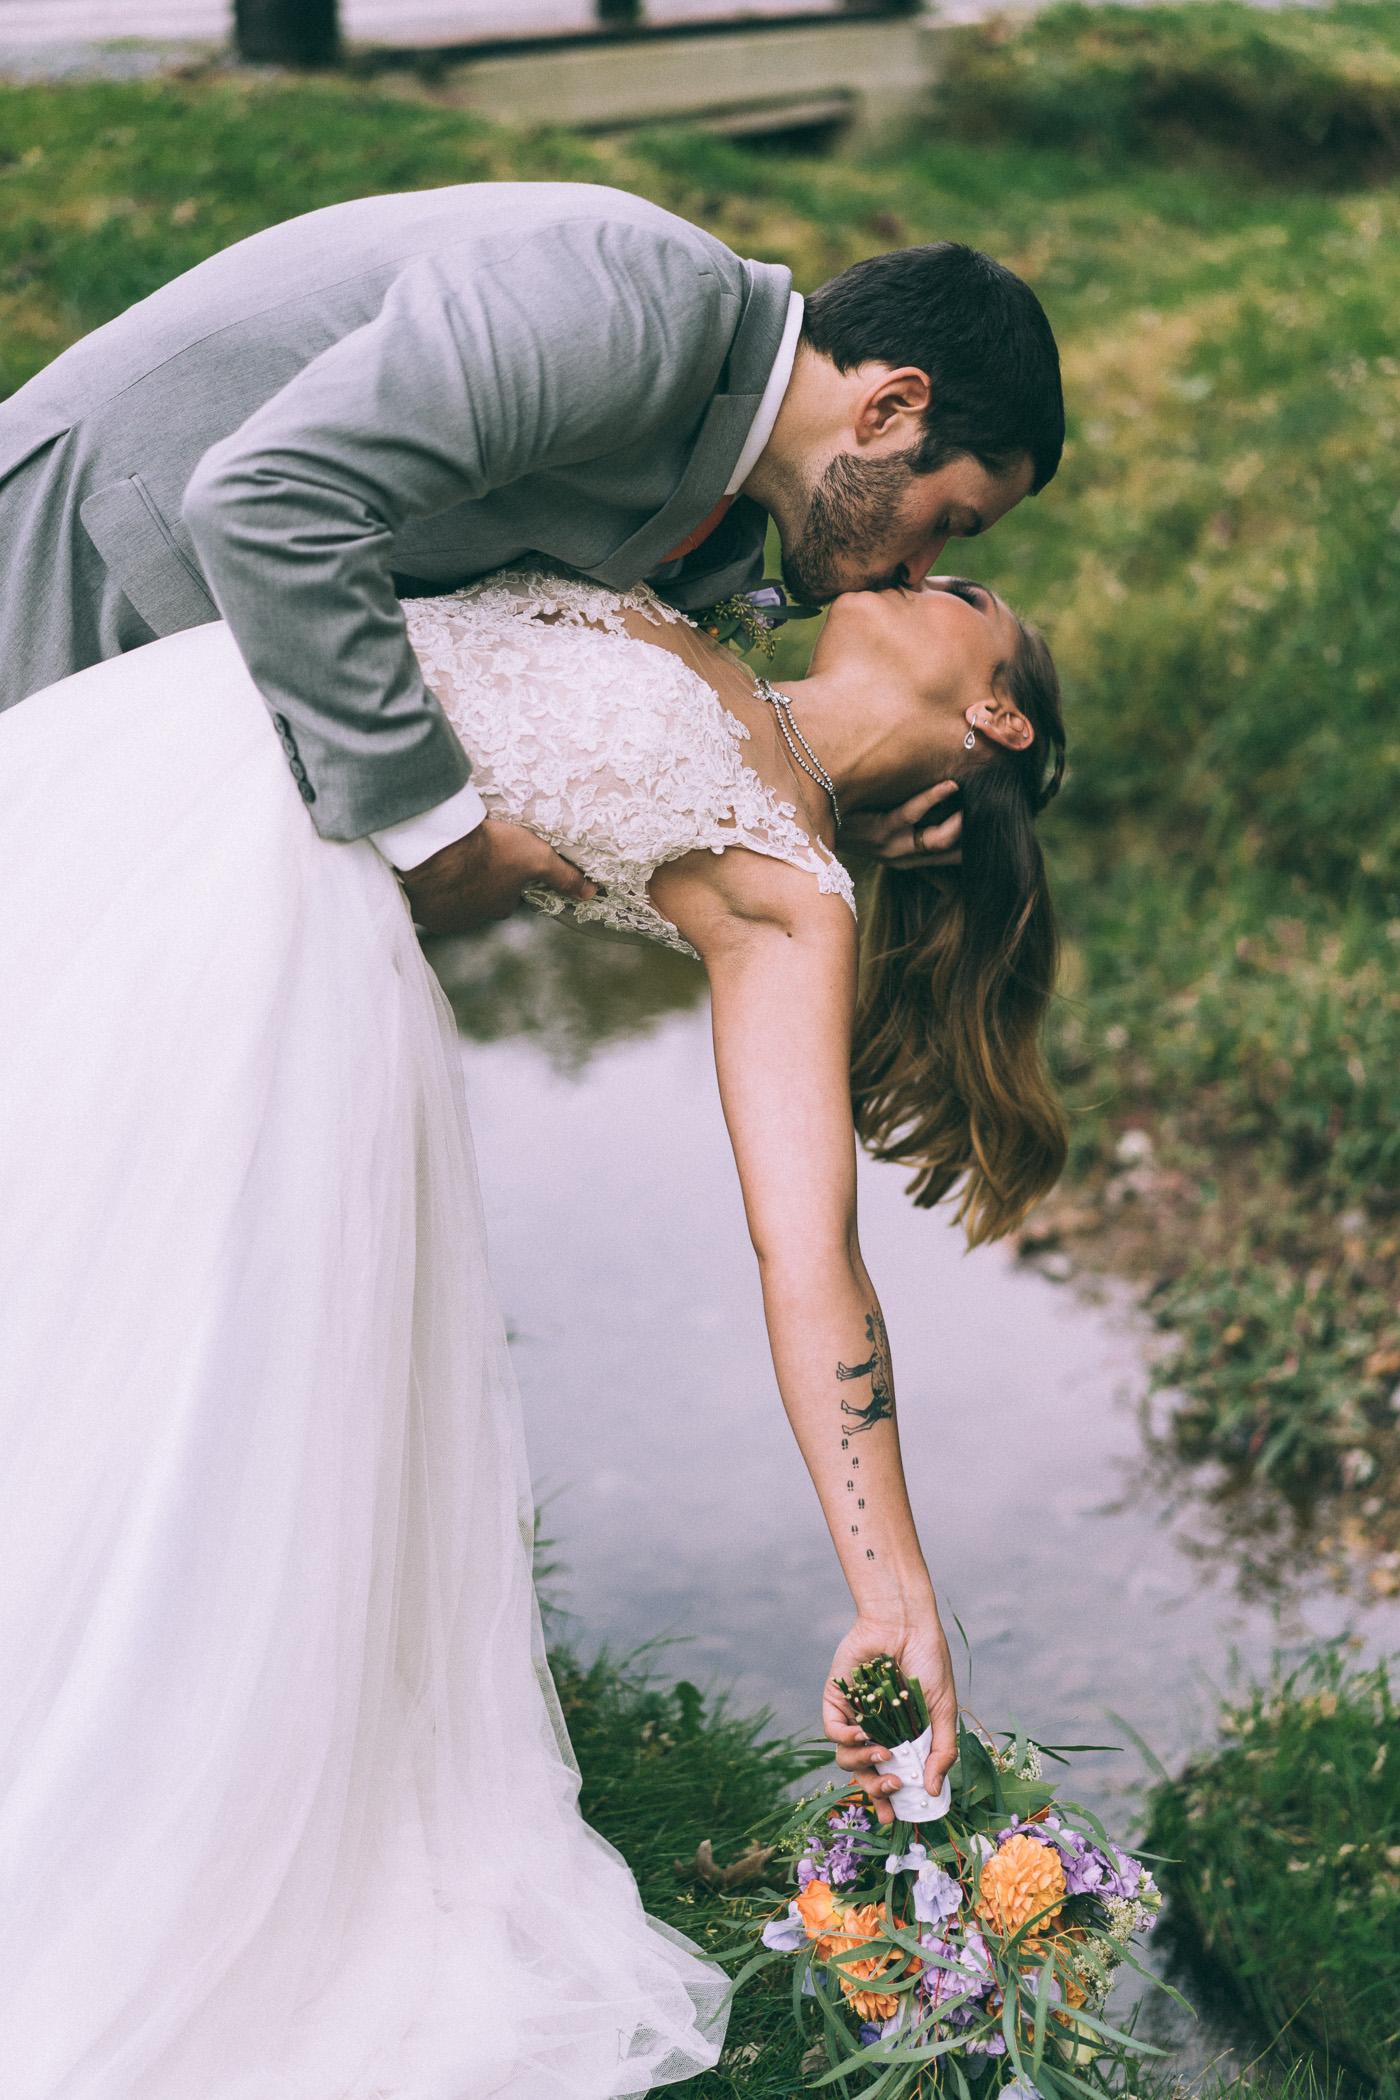 18-Faux Wedding-brandon shane warren-263.jpg